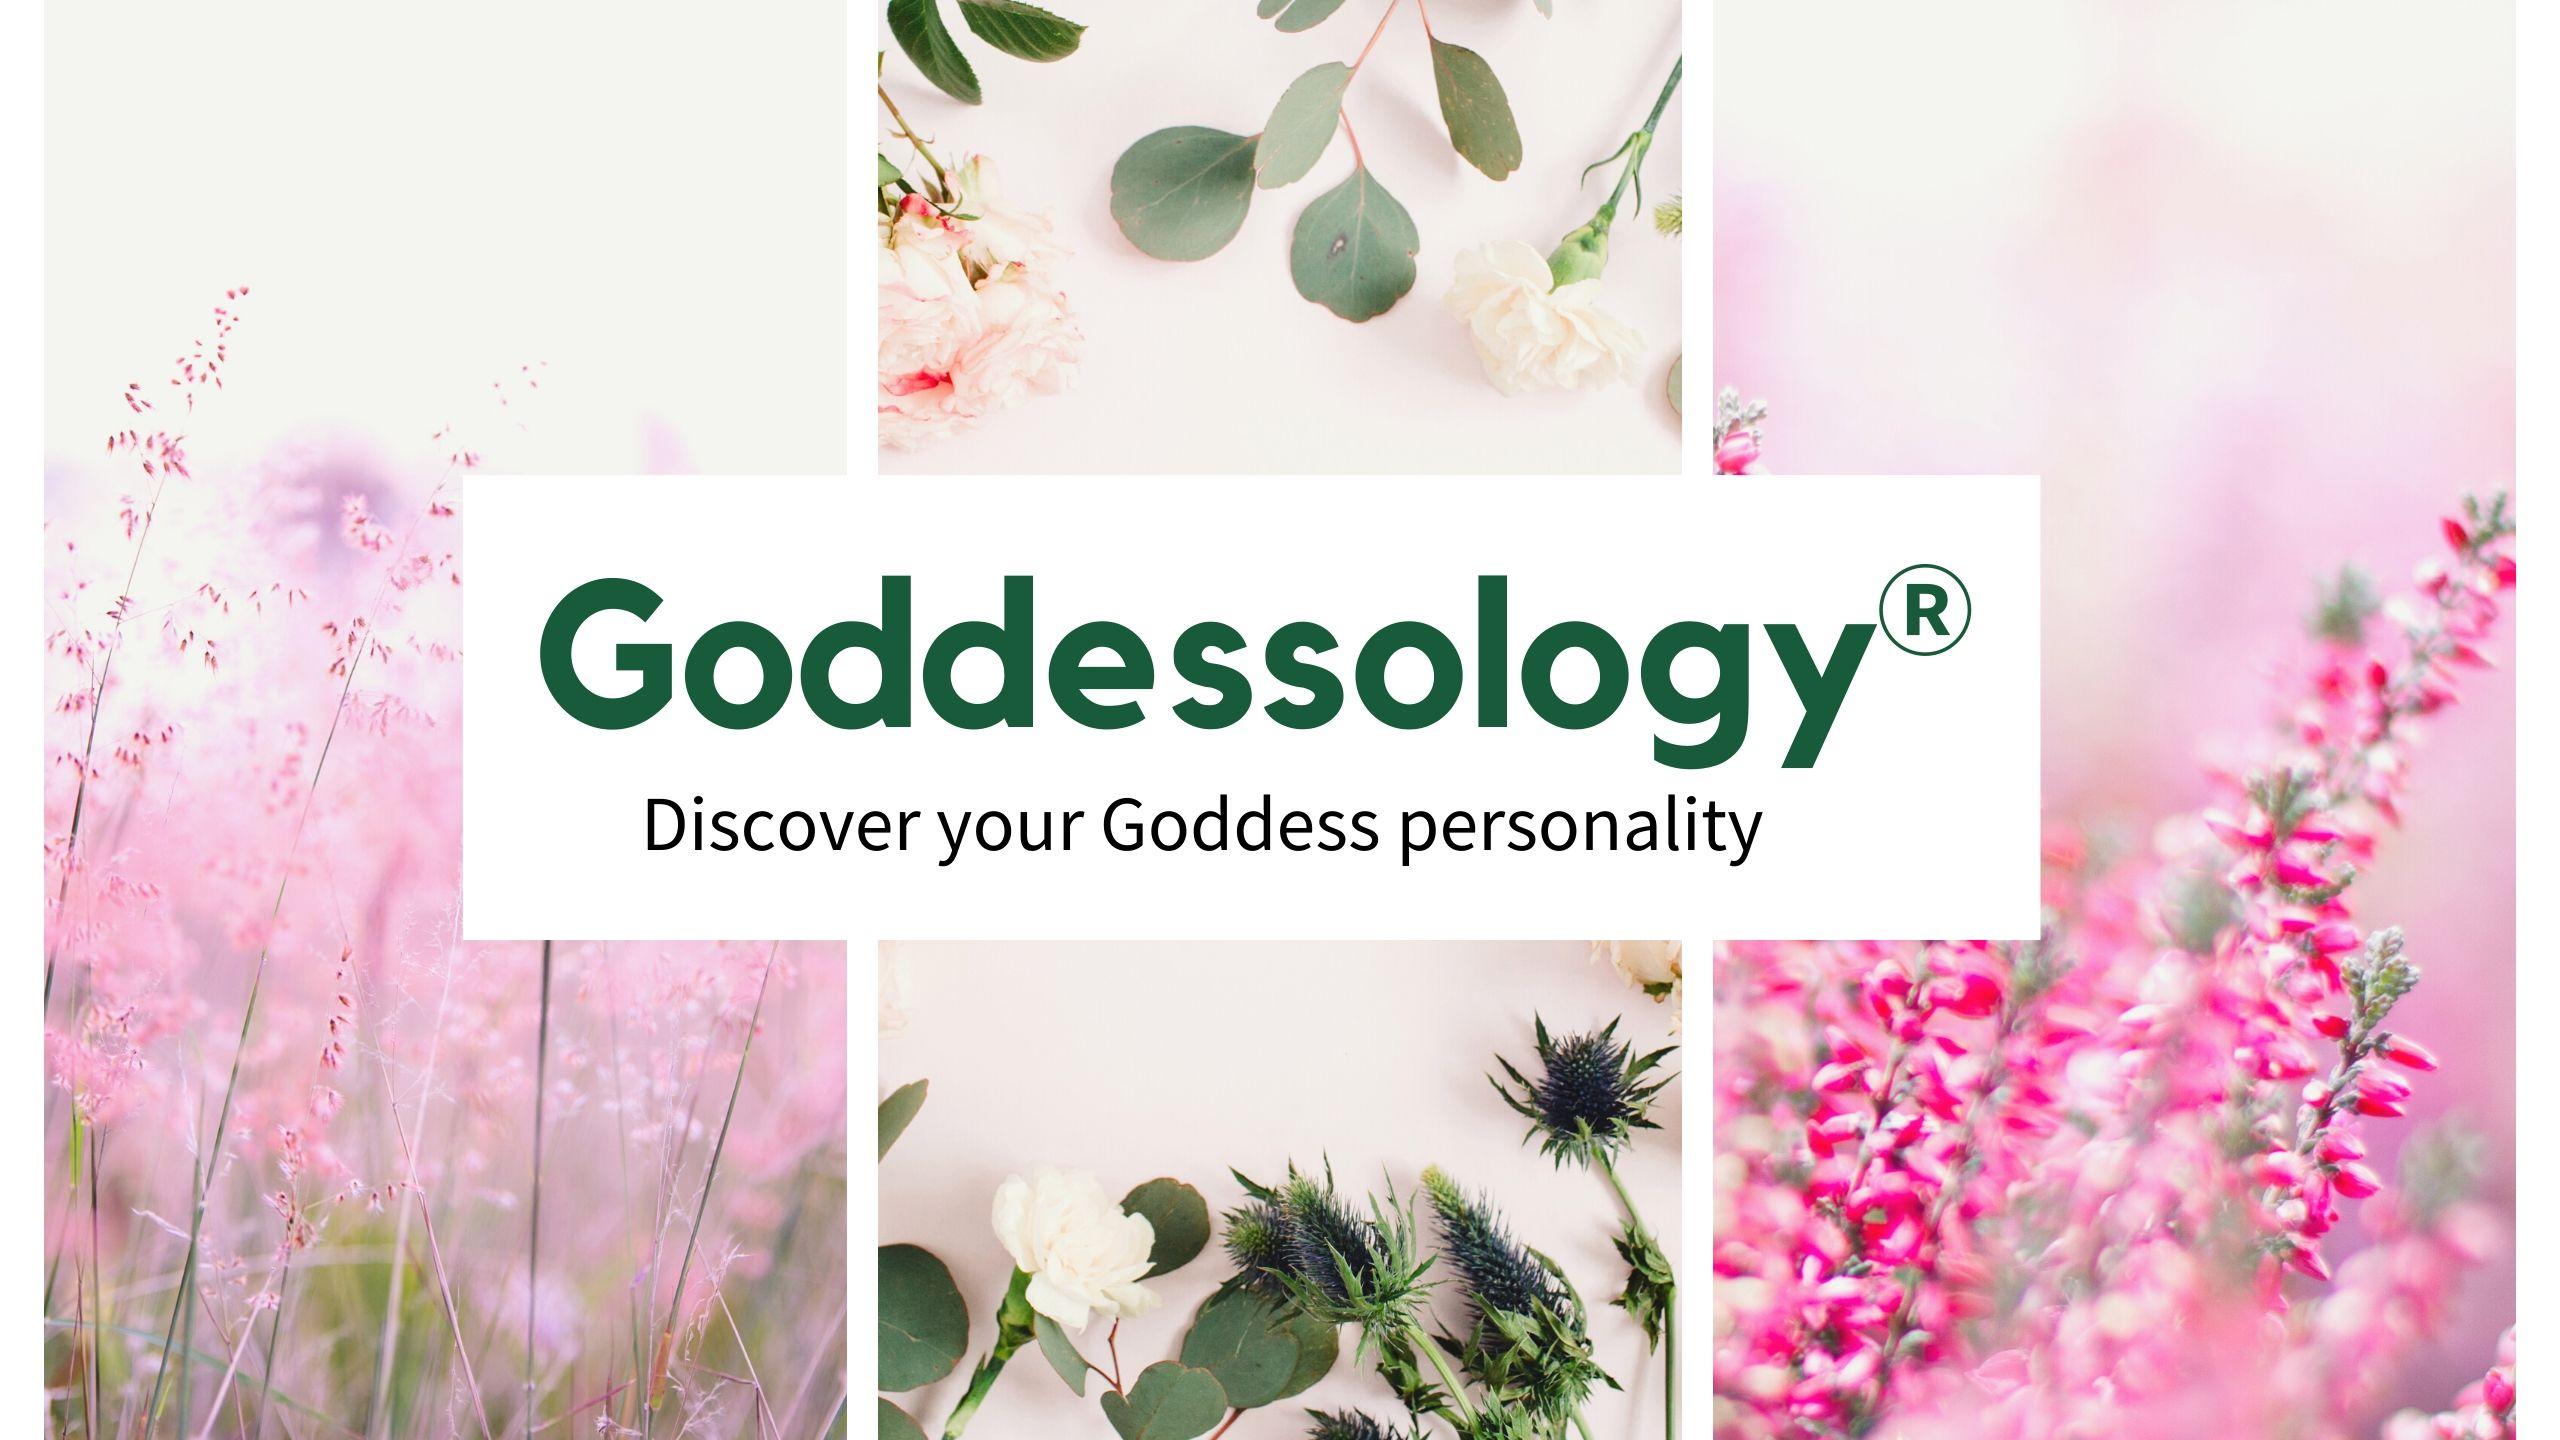 goddessology trishmckinnley.com